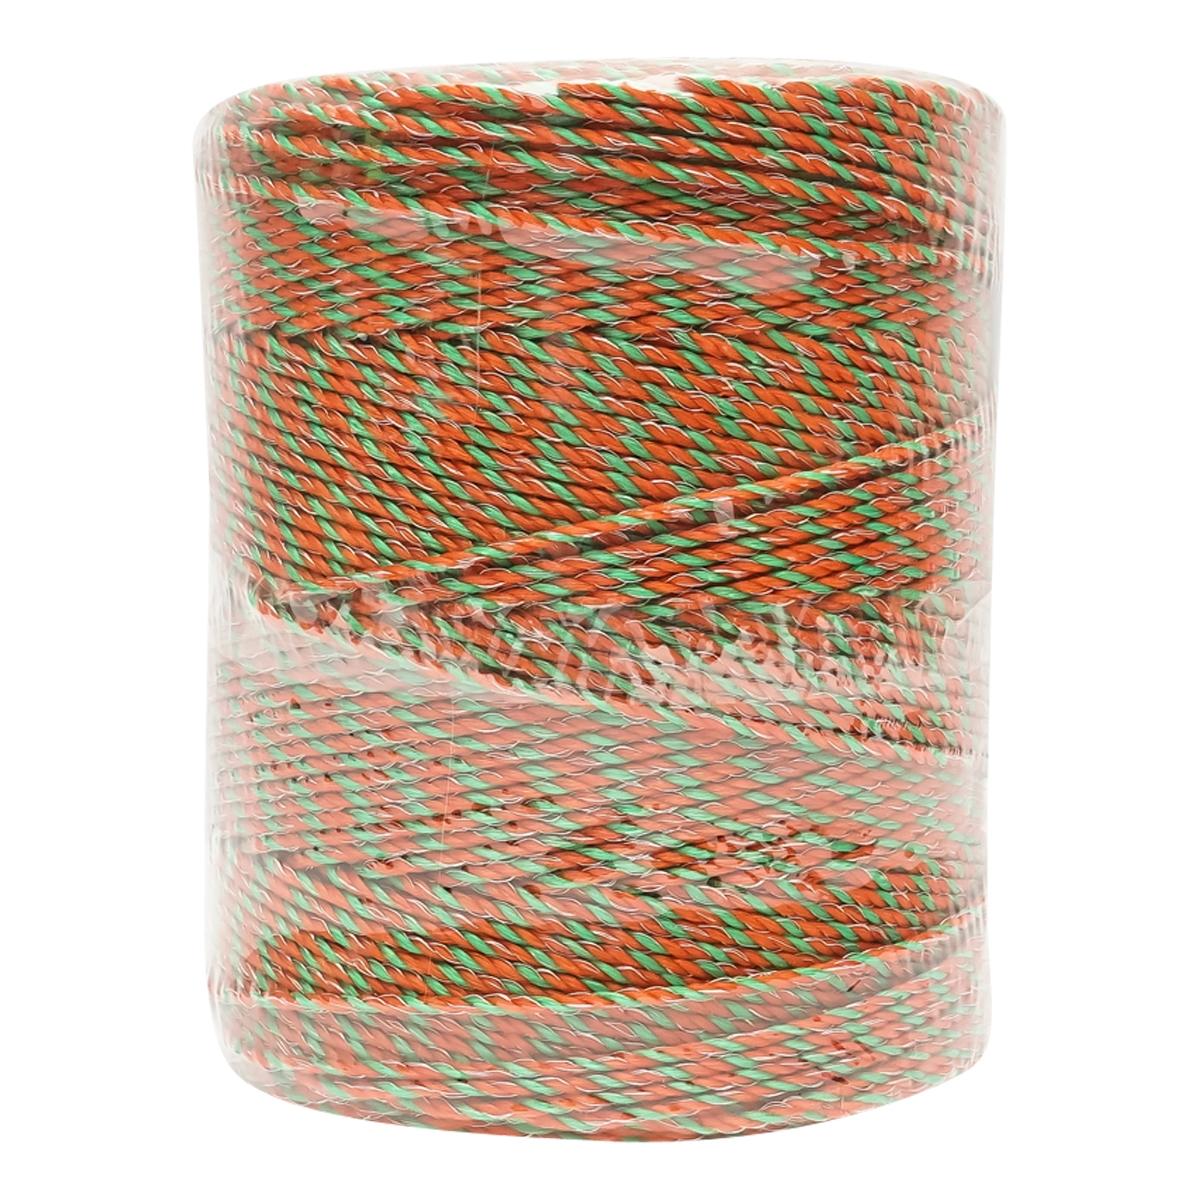 Rola fir portocaliu-verde fi 3 mm 3x0.2mm SS + 2x0.25mm CU, 500M gard electric Breckner Germany